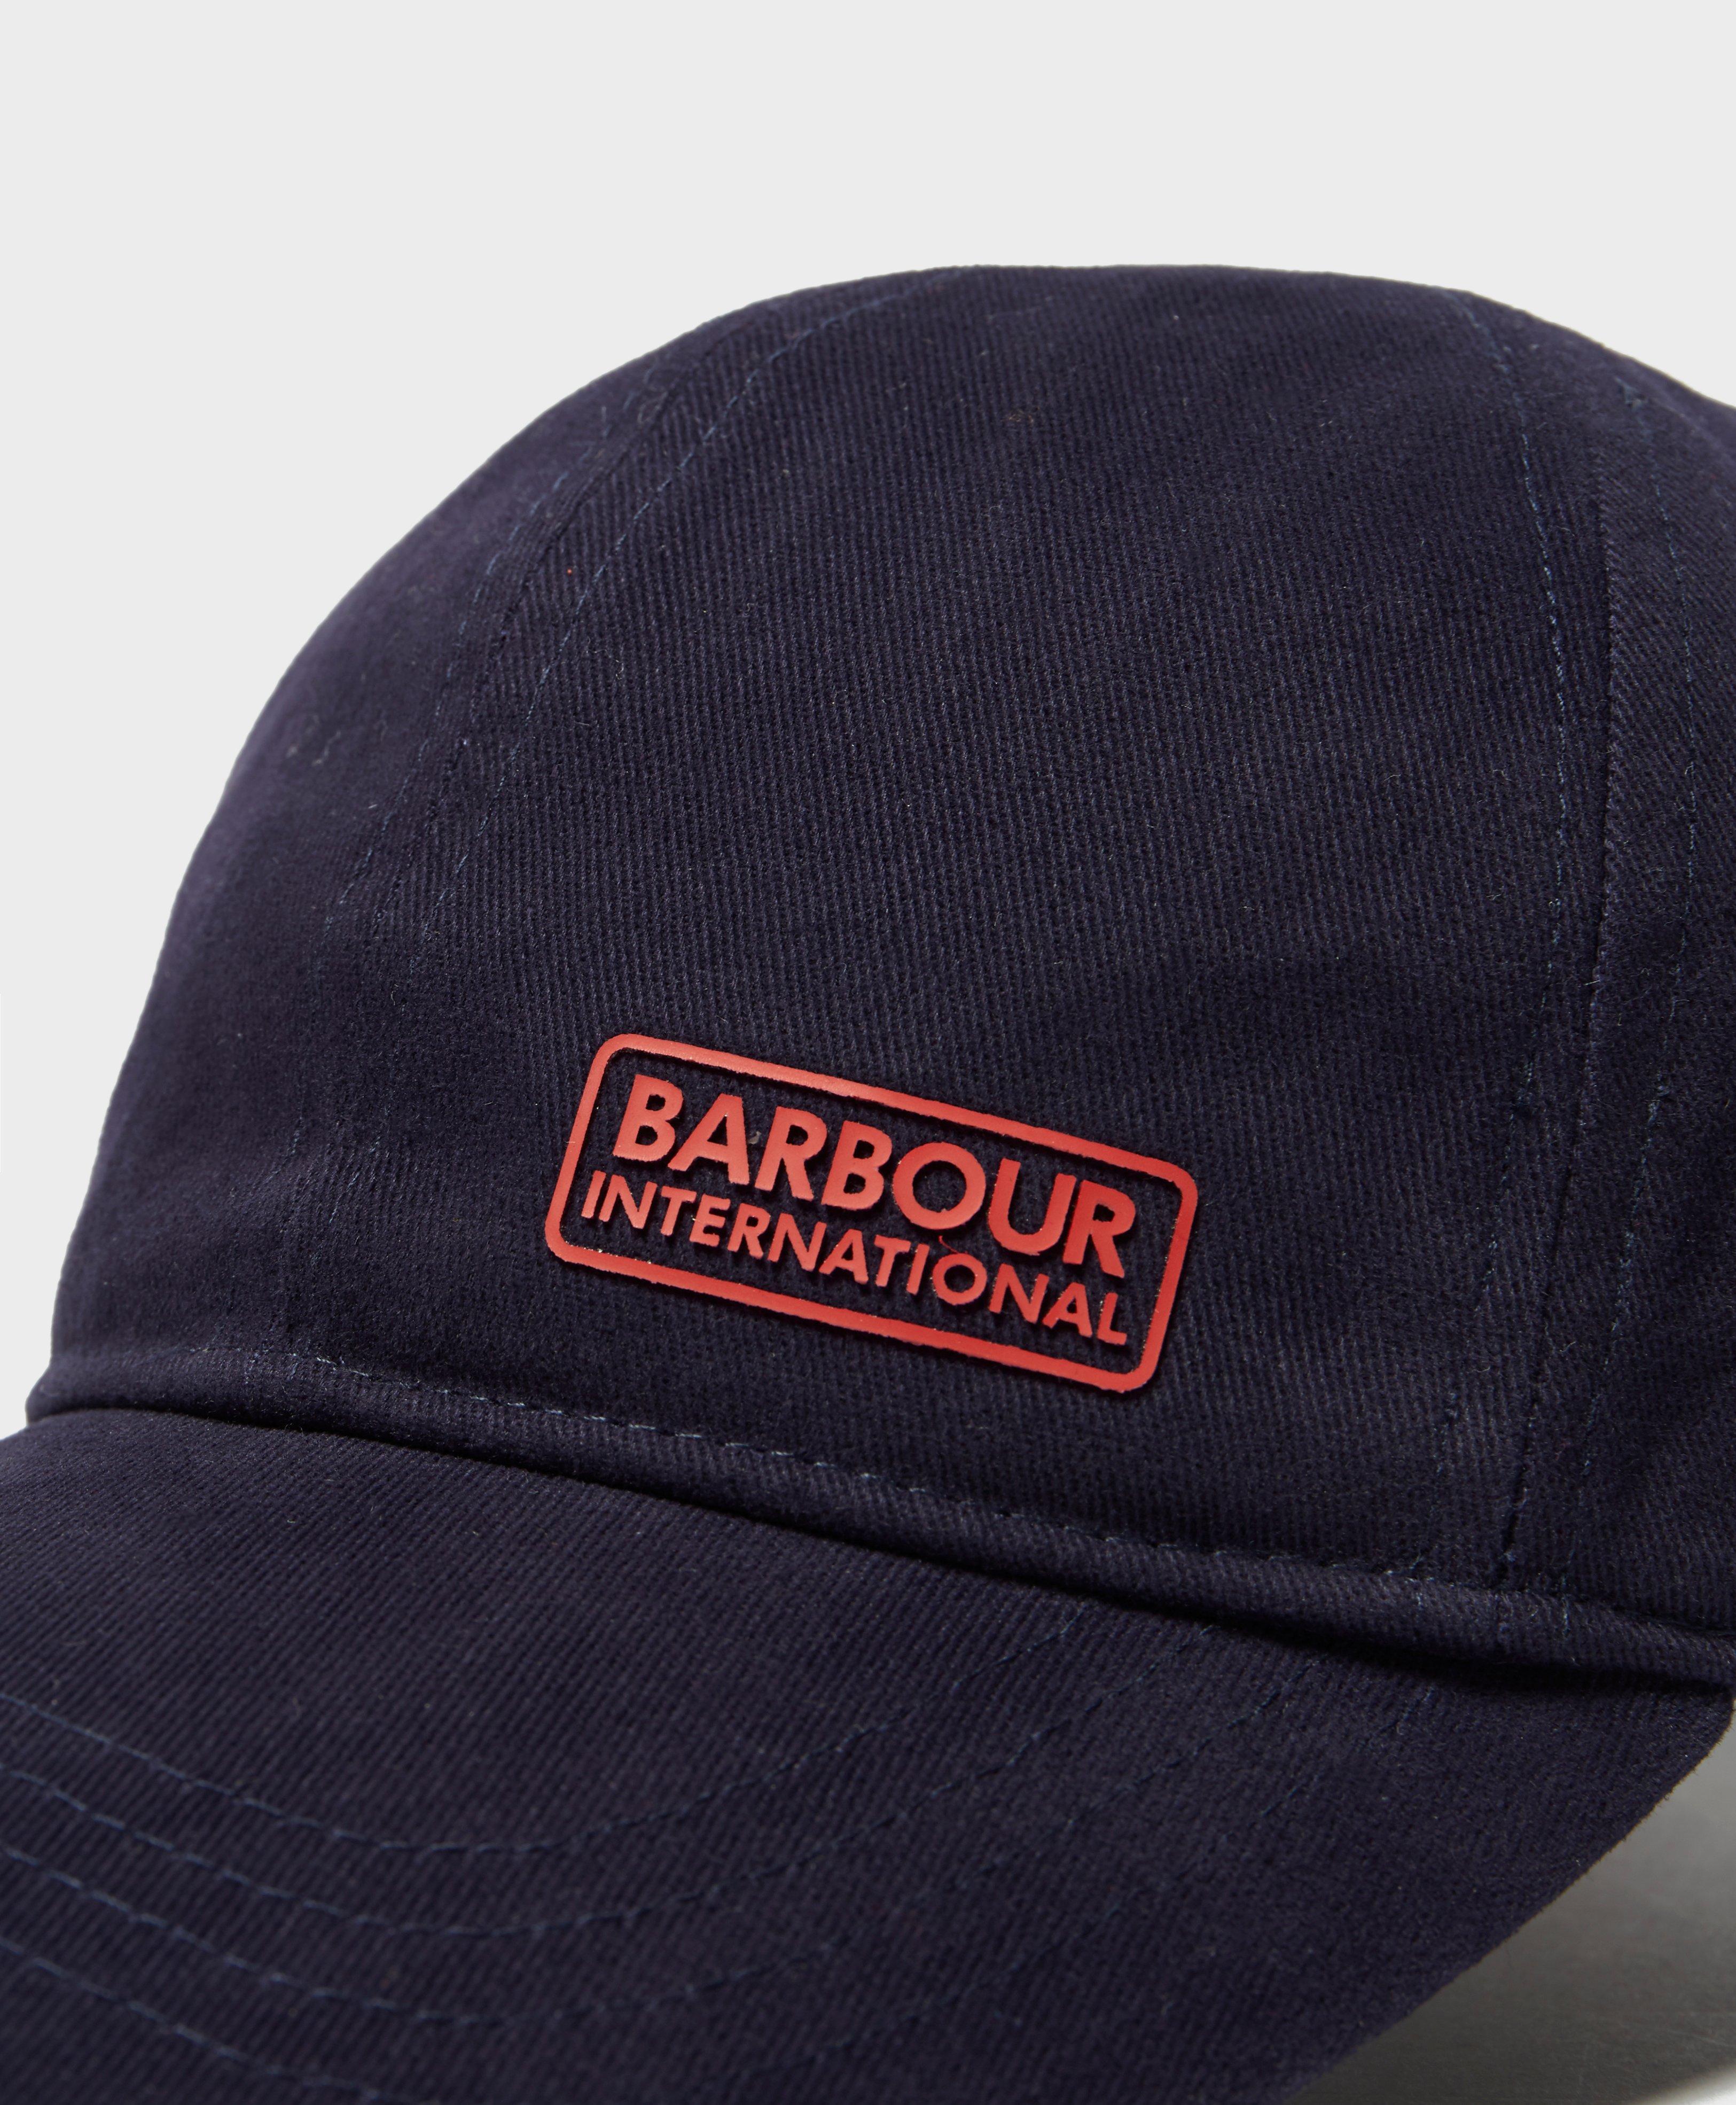 7d41e7c0cca Lyst - Barbour International Drill Cap in Blue for Men